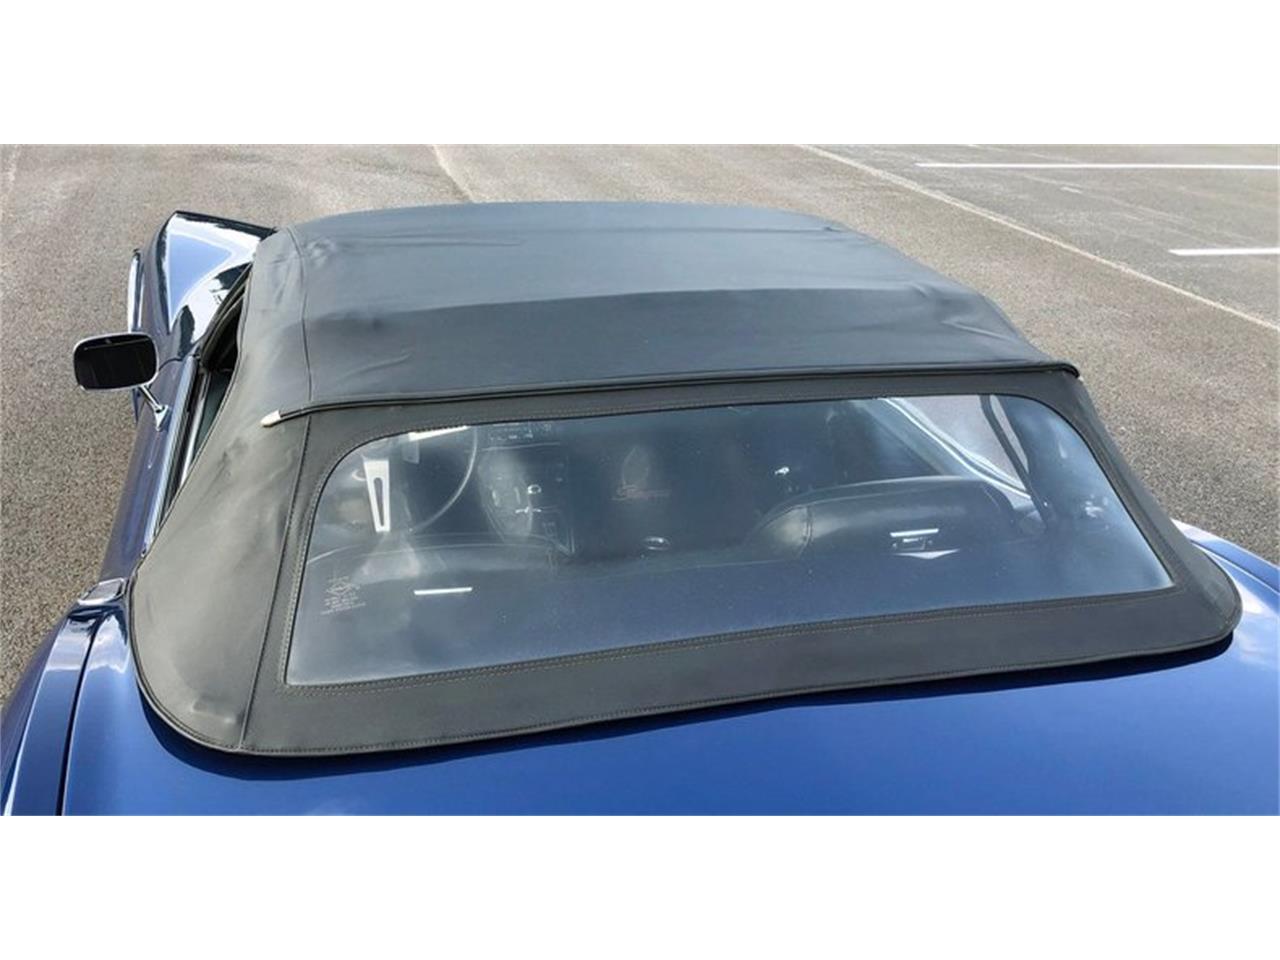 1973 Chevrolet Corvette (CC-1391746) for sale in West Chester, Pennsylvania